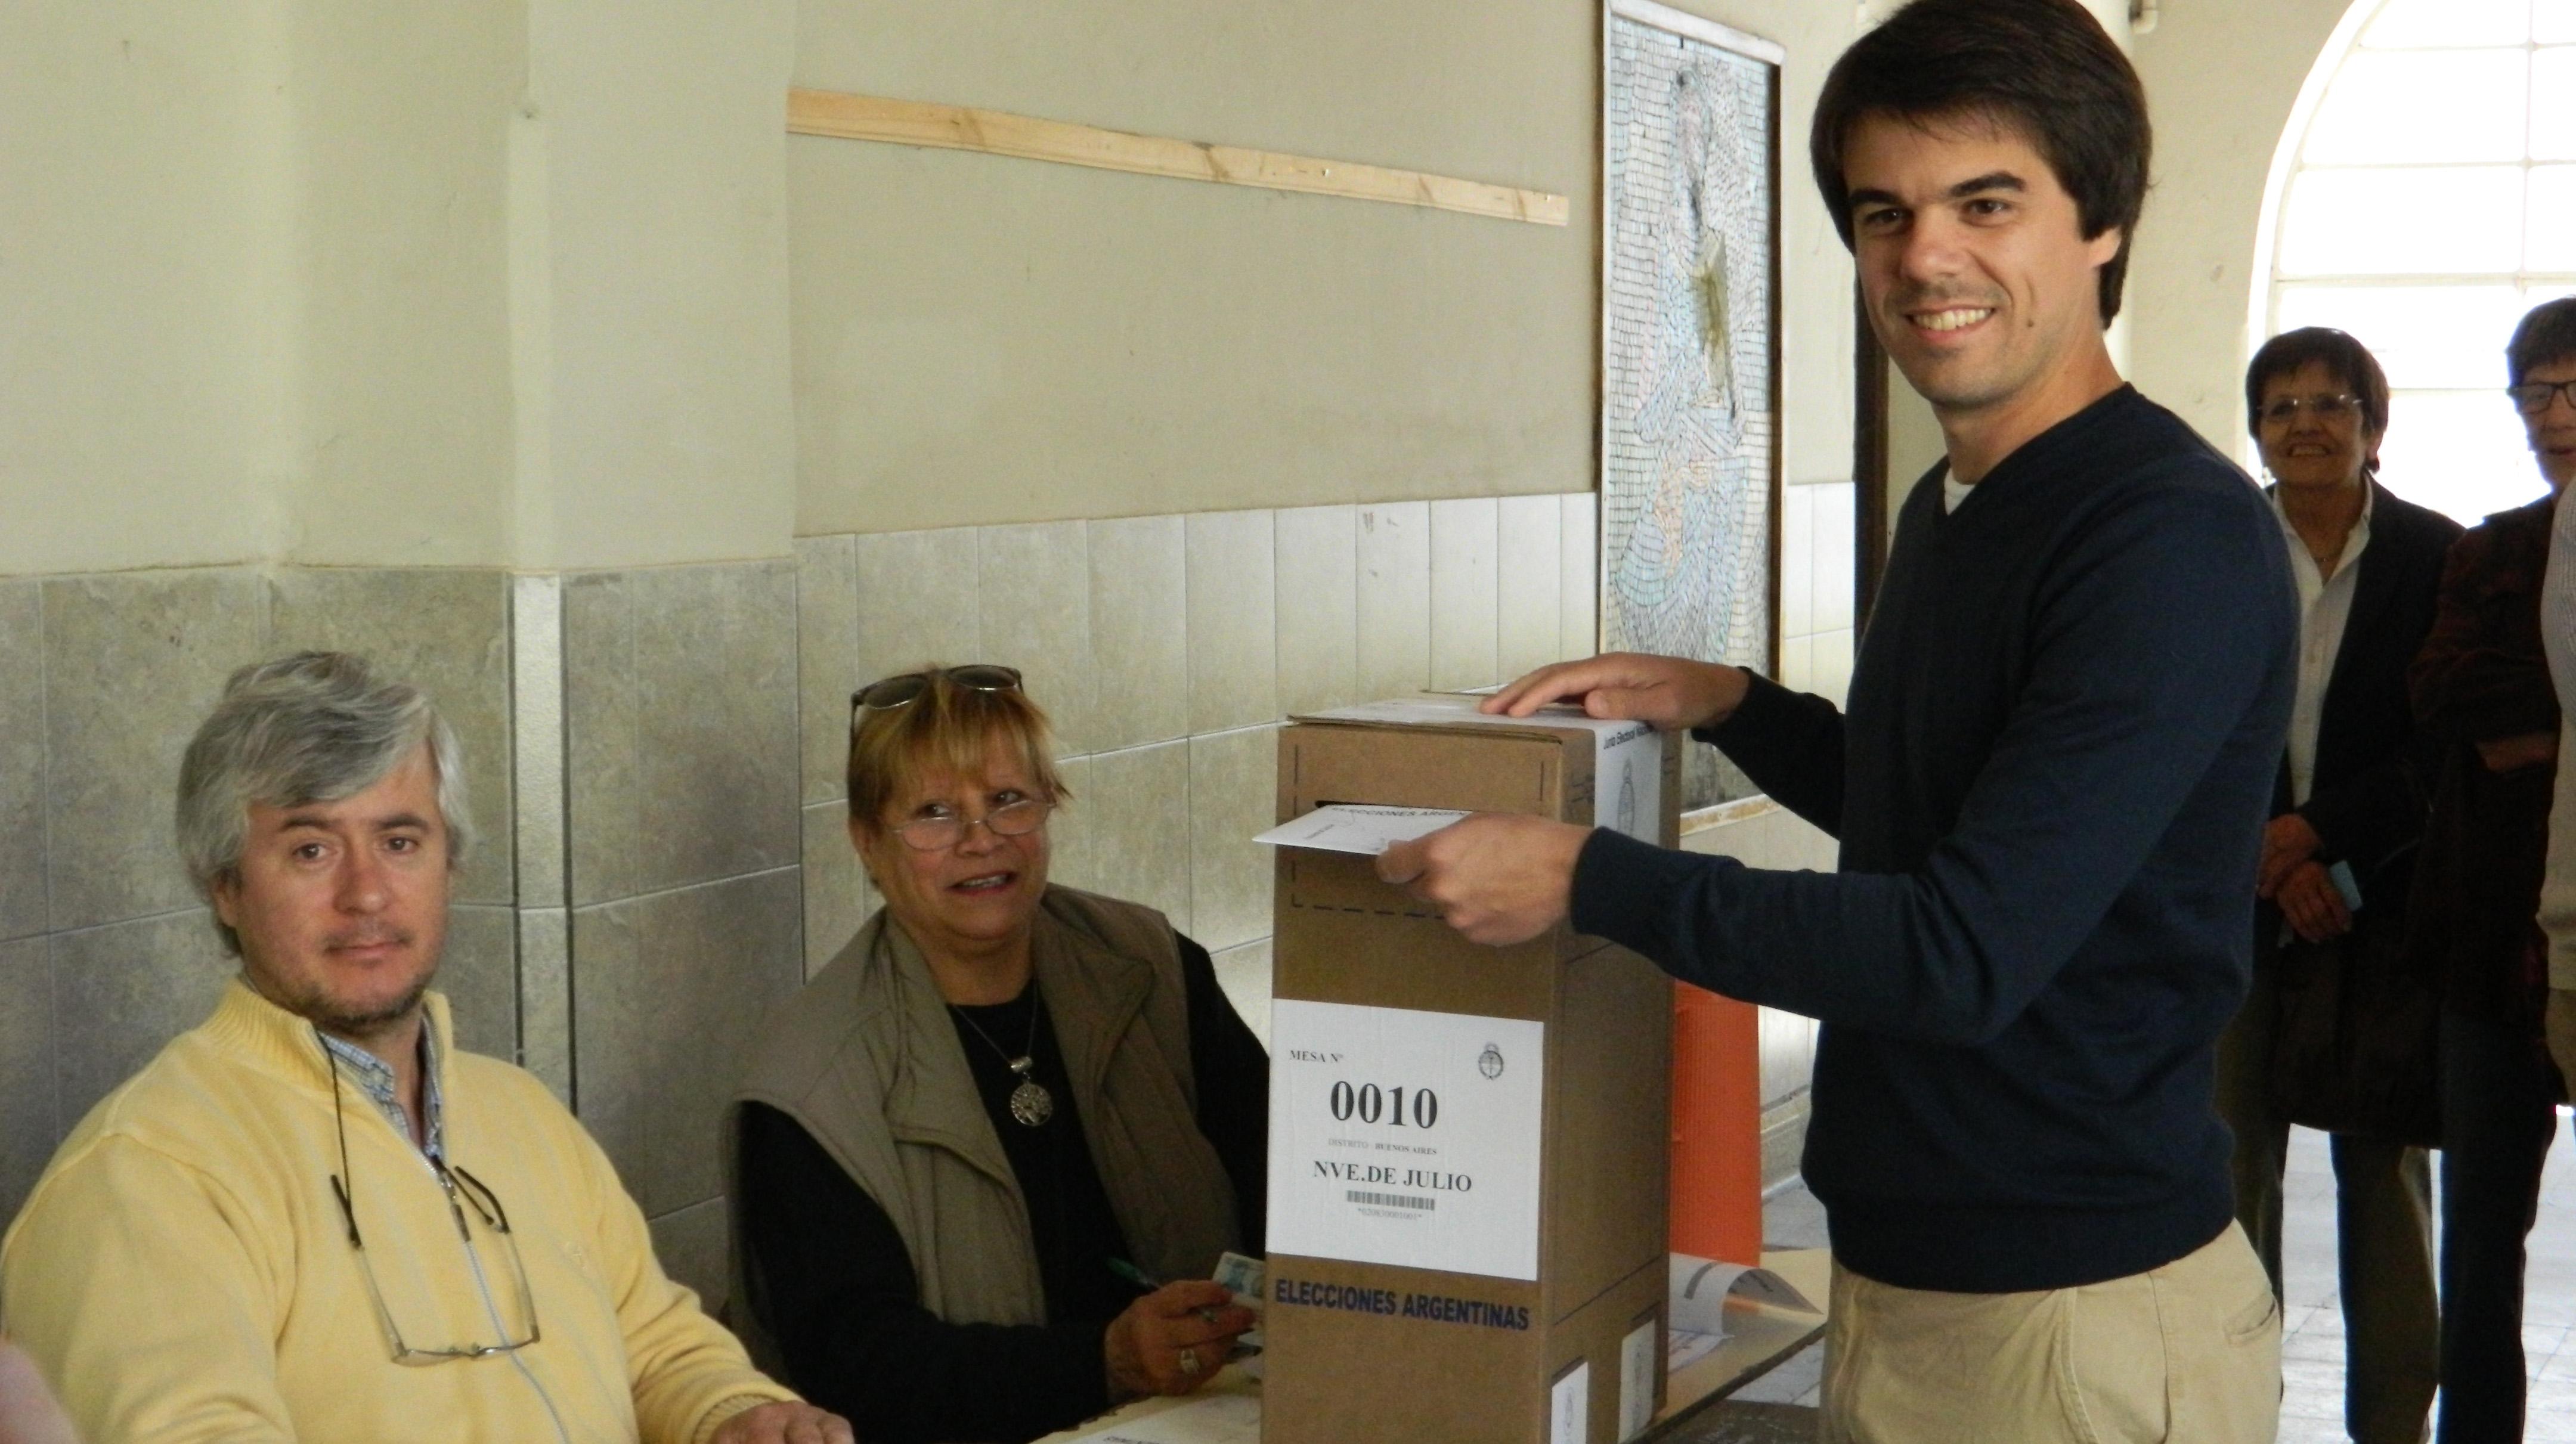 Votó Paolo Barbieri